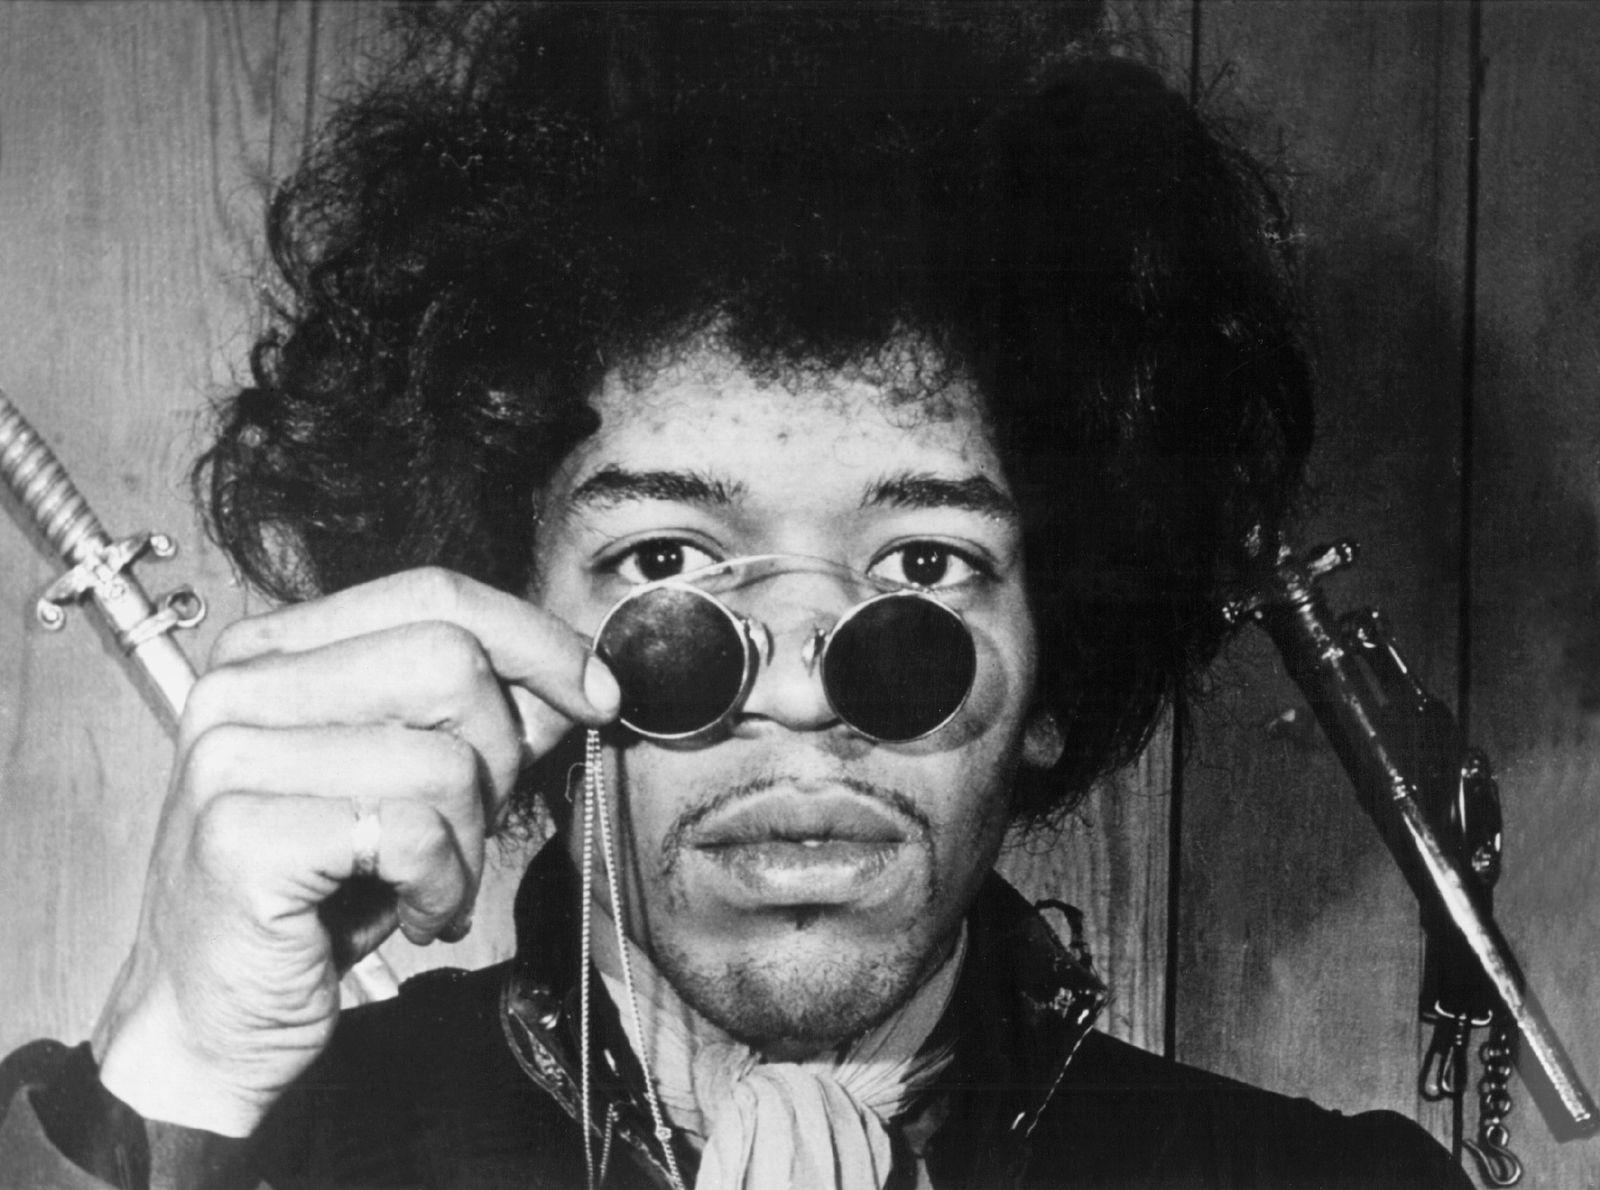 EINMALIGE VERWENDUNG Gitarren-Genie Jimi Hendrix wäre 65 geworden